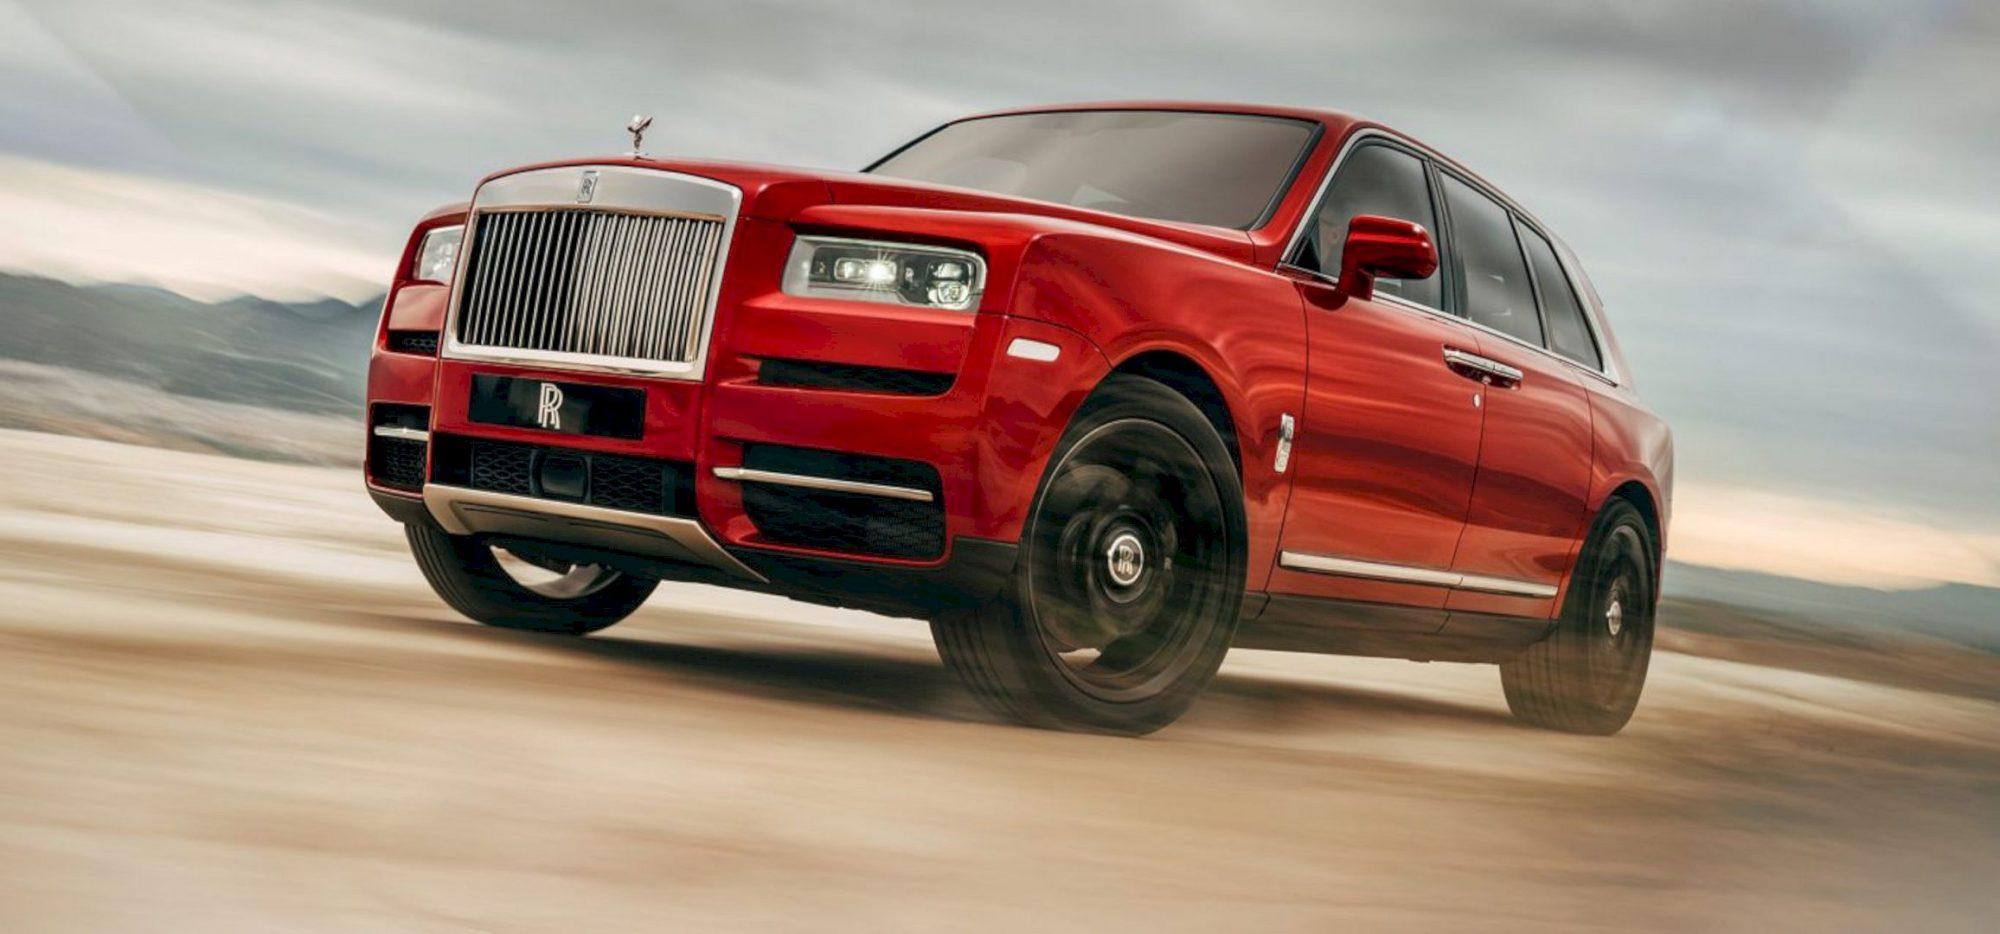 Rolls-Royce Cullinan: Freedom Absolute - Supreme Liberty